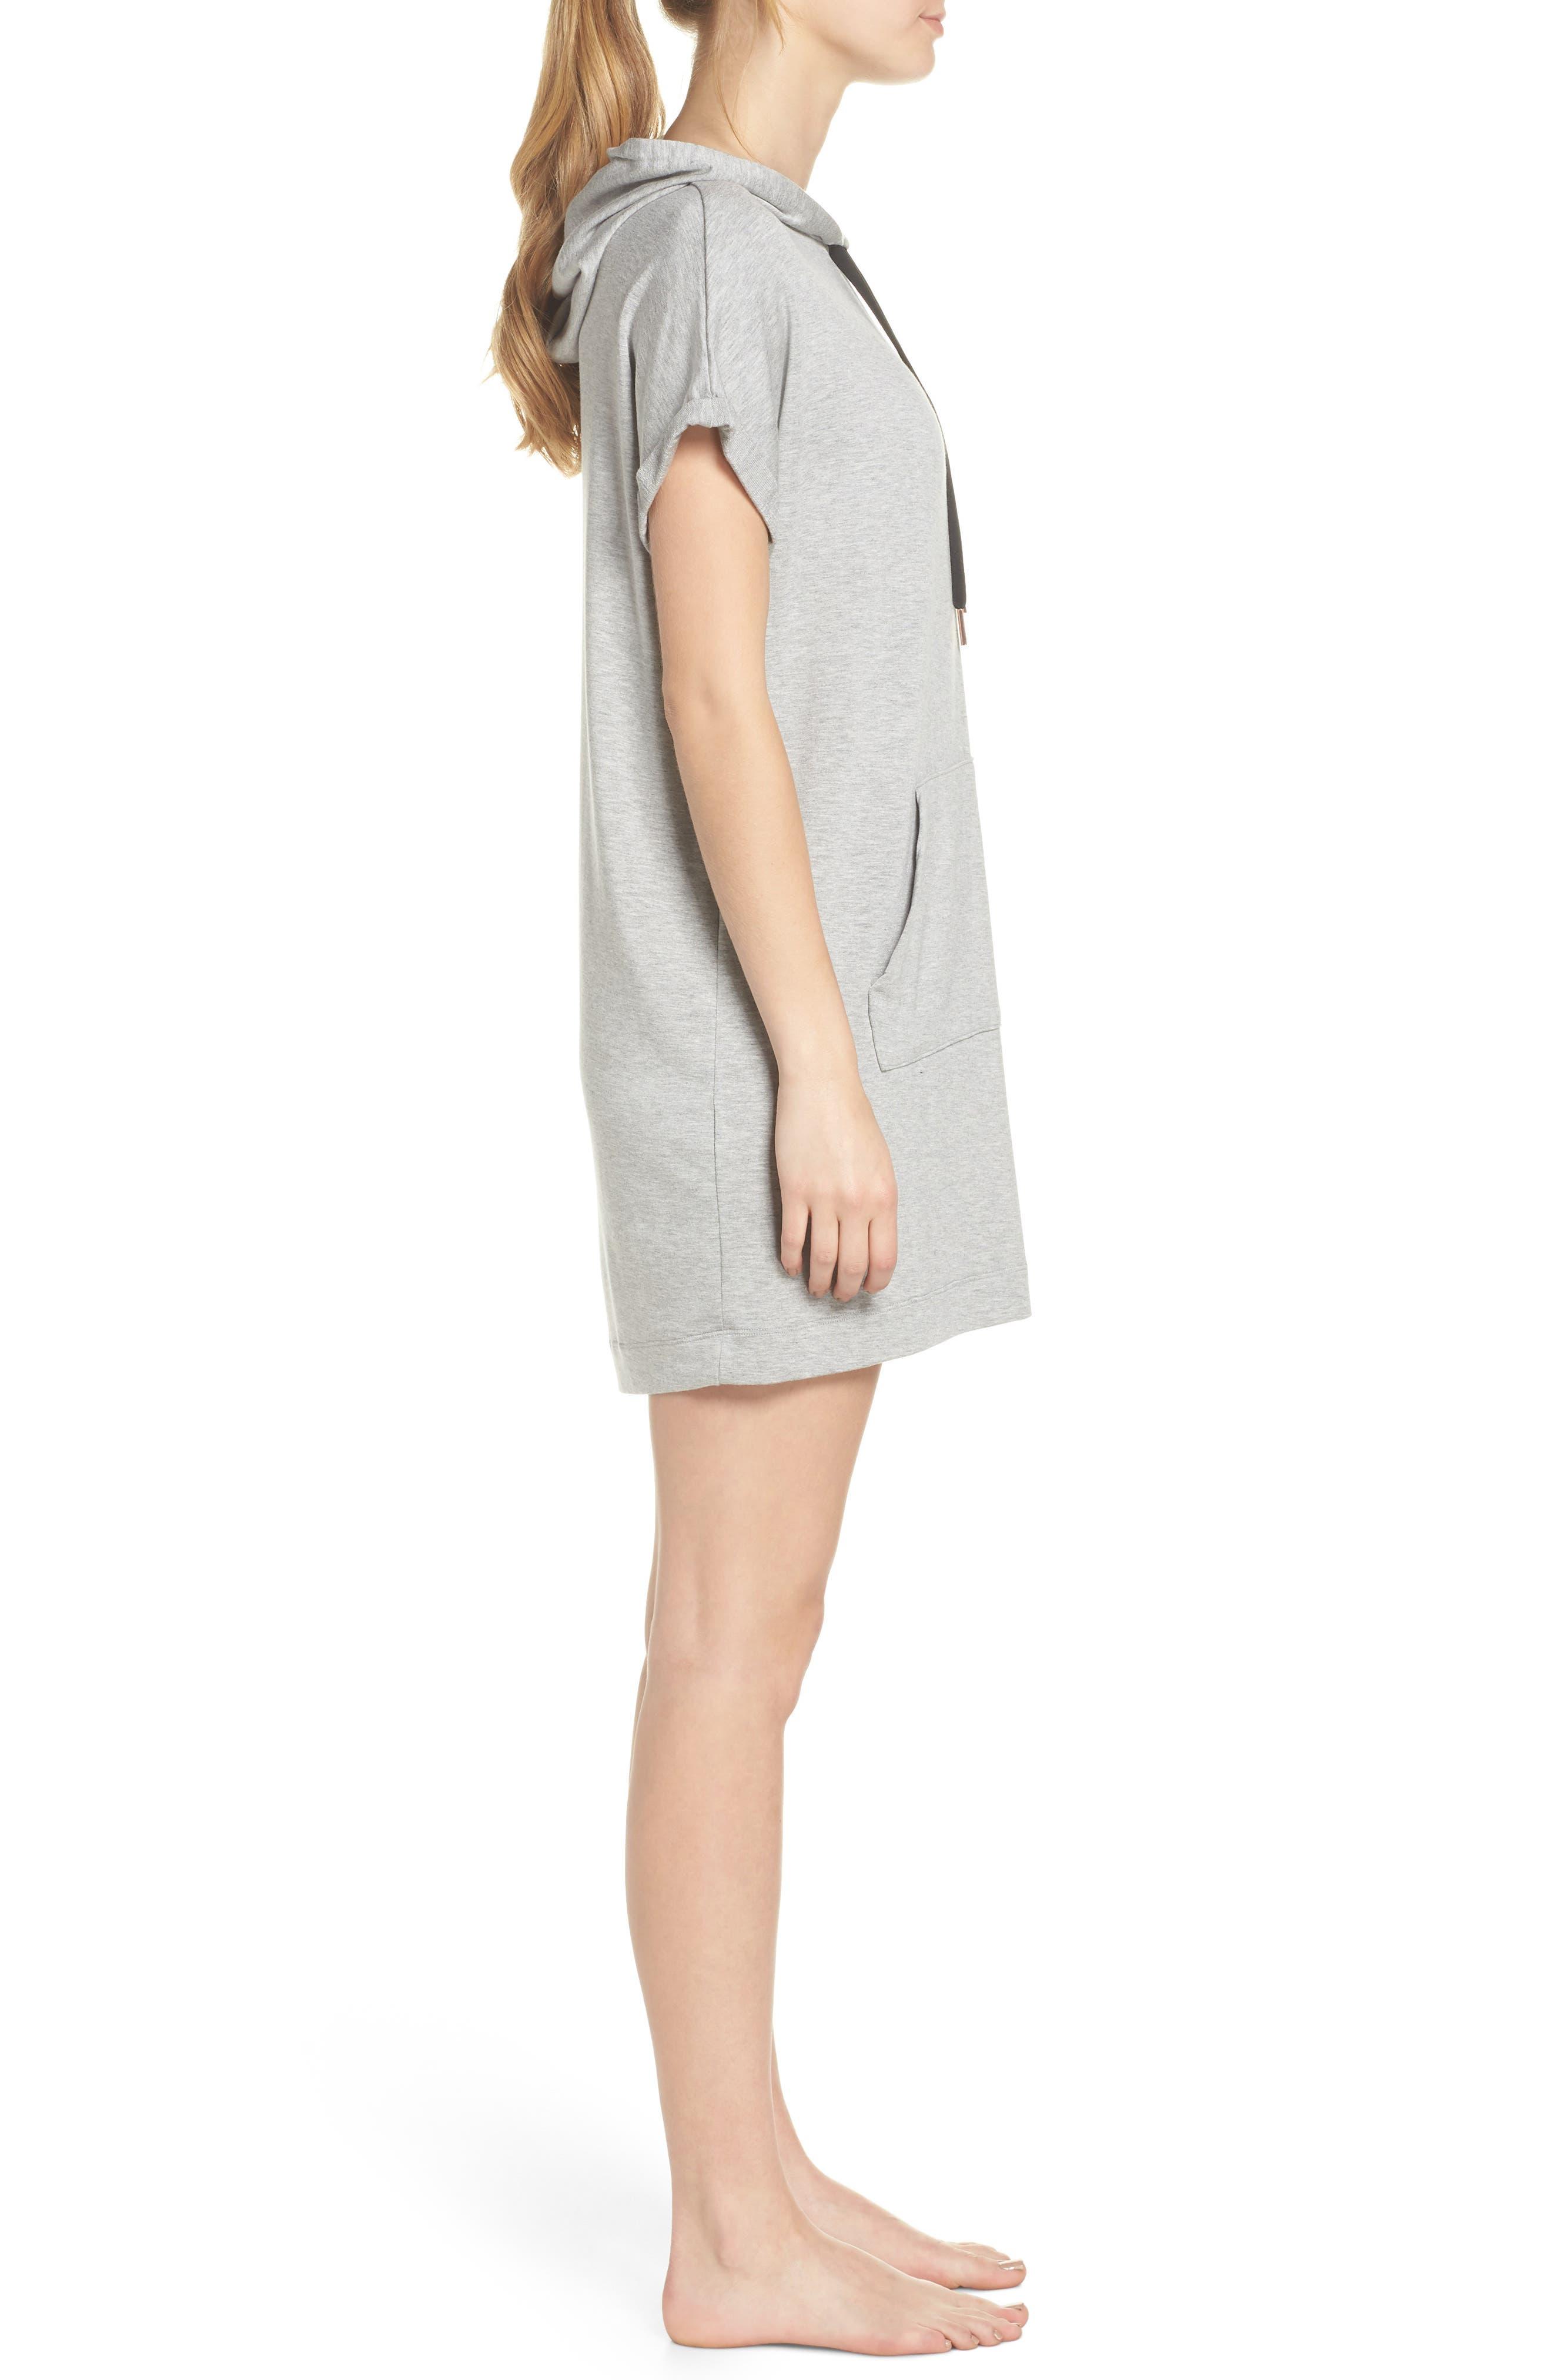 It's All Hoodie Hooded Sweatshirt Dress,                             Alternate thumbnail 3, color,                             LIGHT HEATHER GRAY